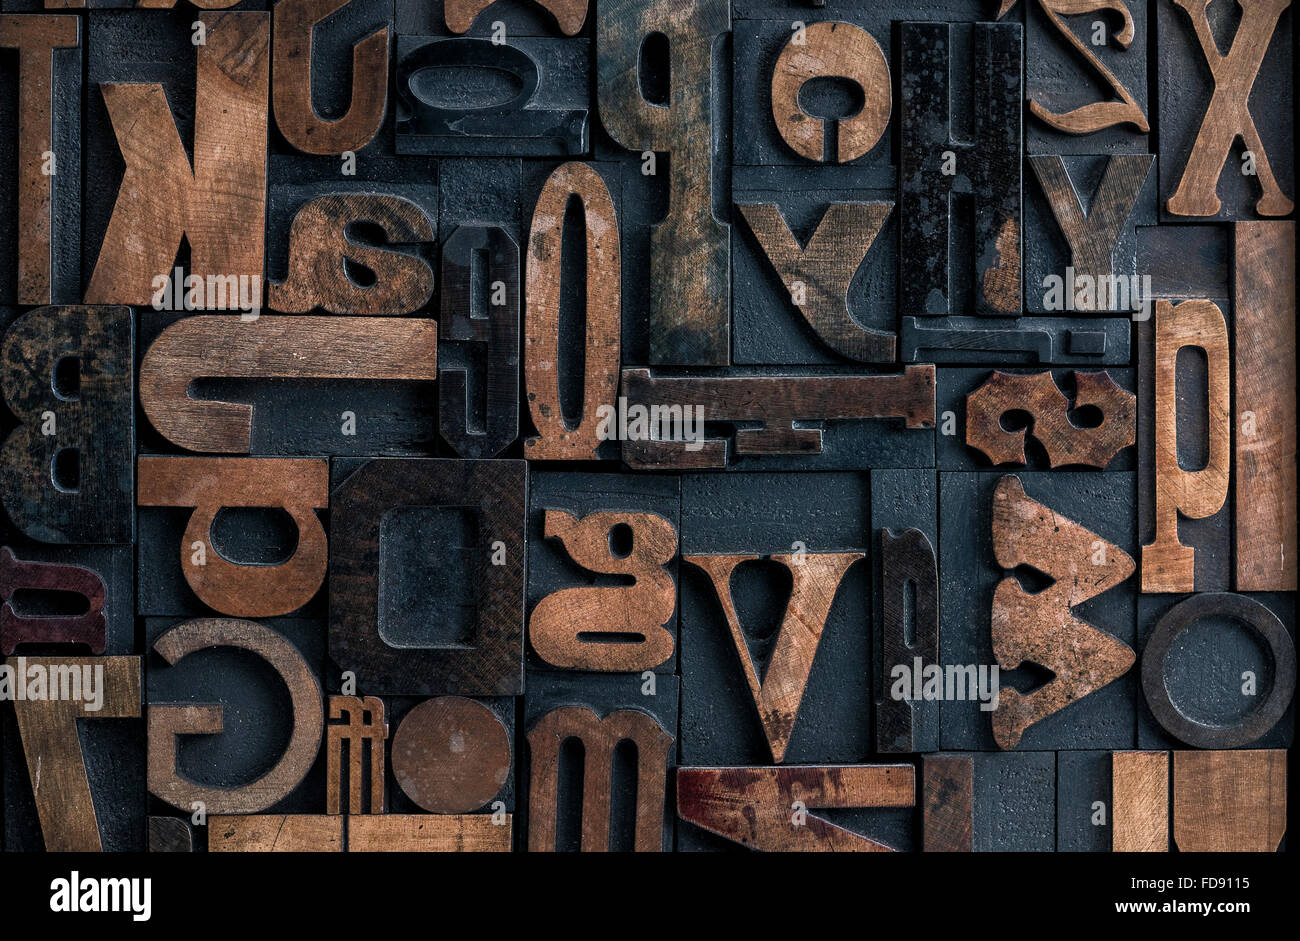 Colección de diversas maderas para escribir letras para imprimir Imagen De Stock